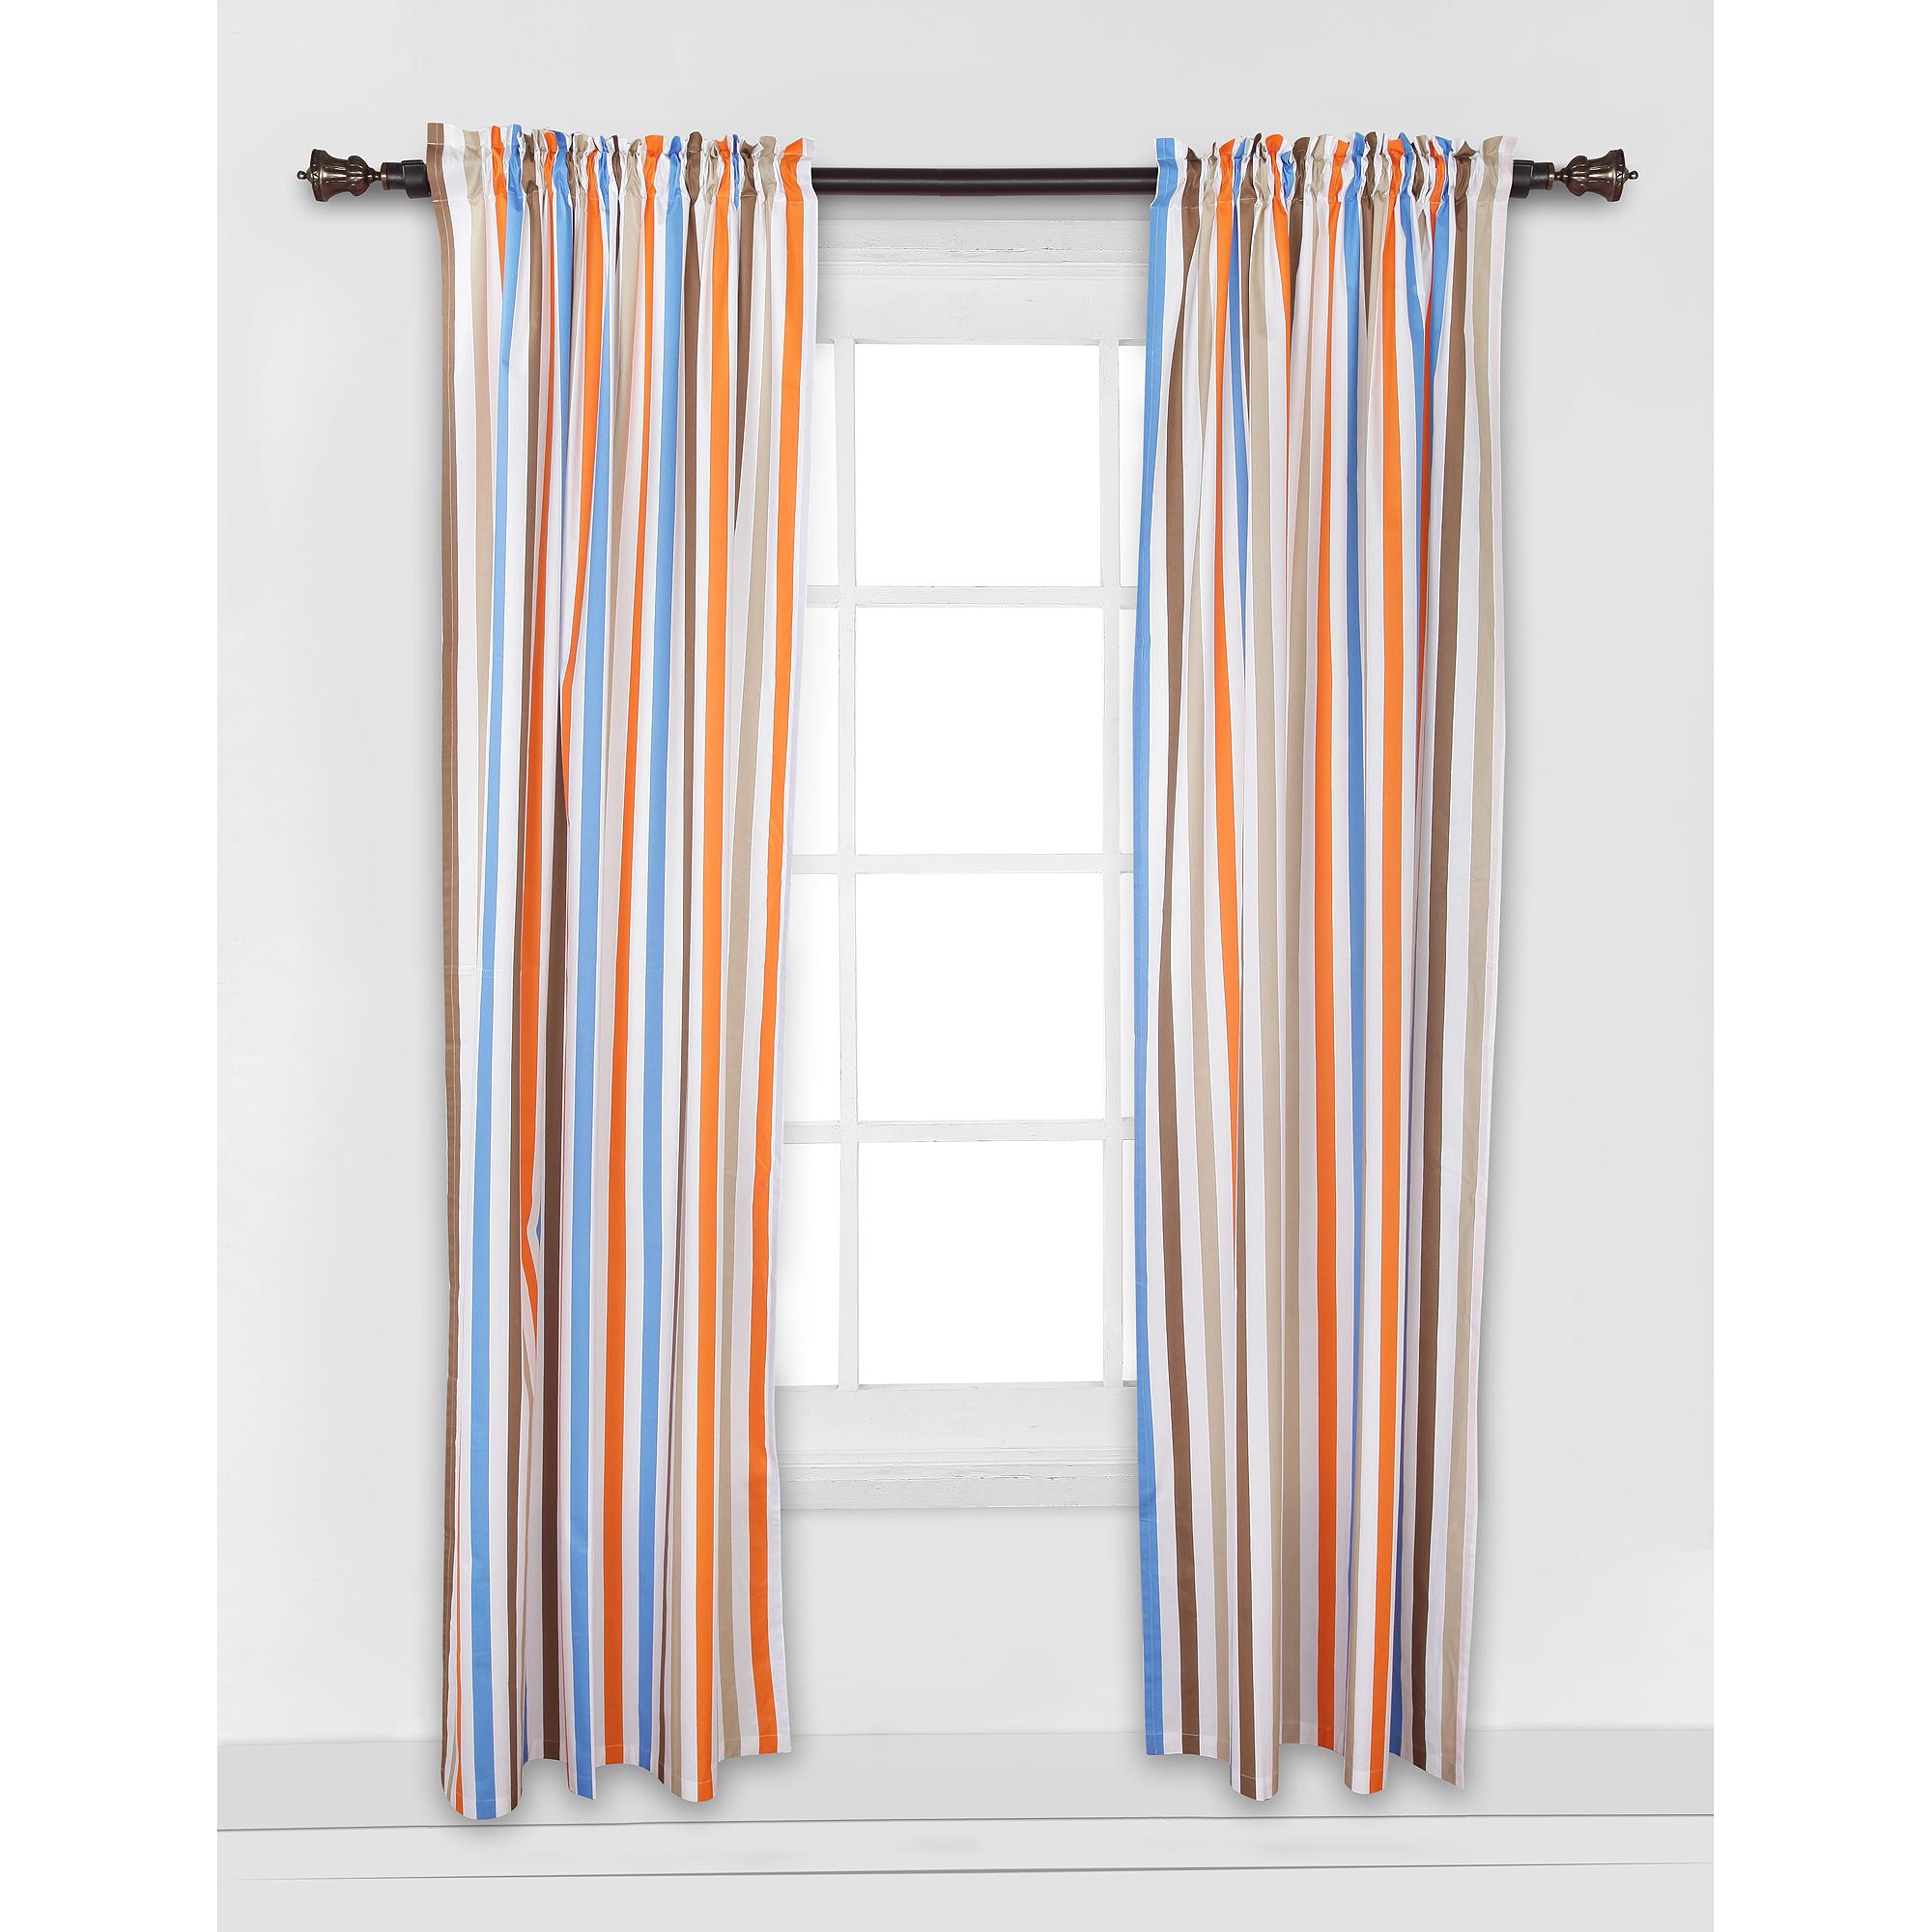 "Bacati Mod Sports Stripes Curtain Panel 42""x84"" 100% Cotton percale fabrics"